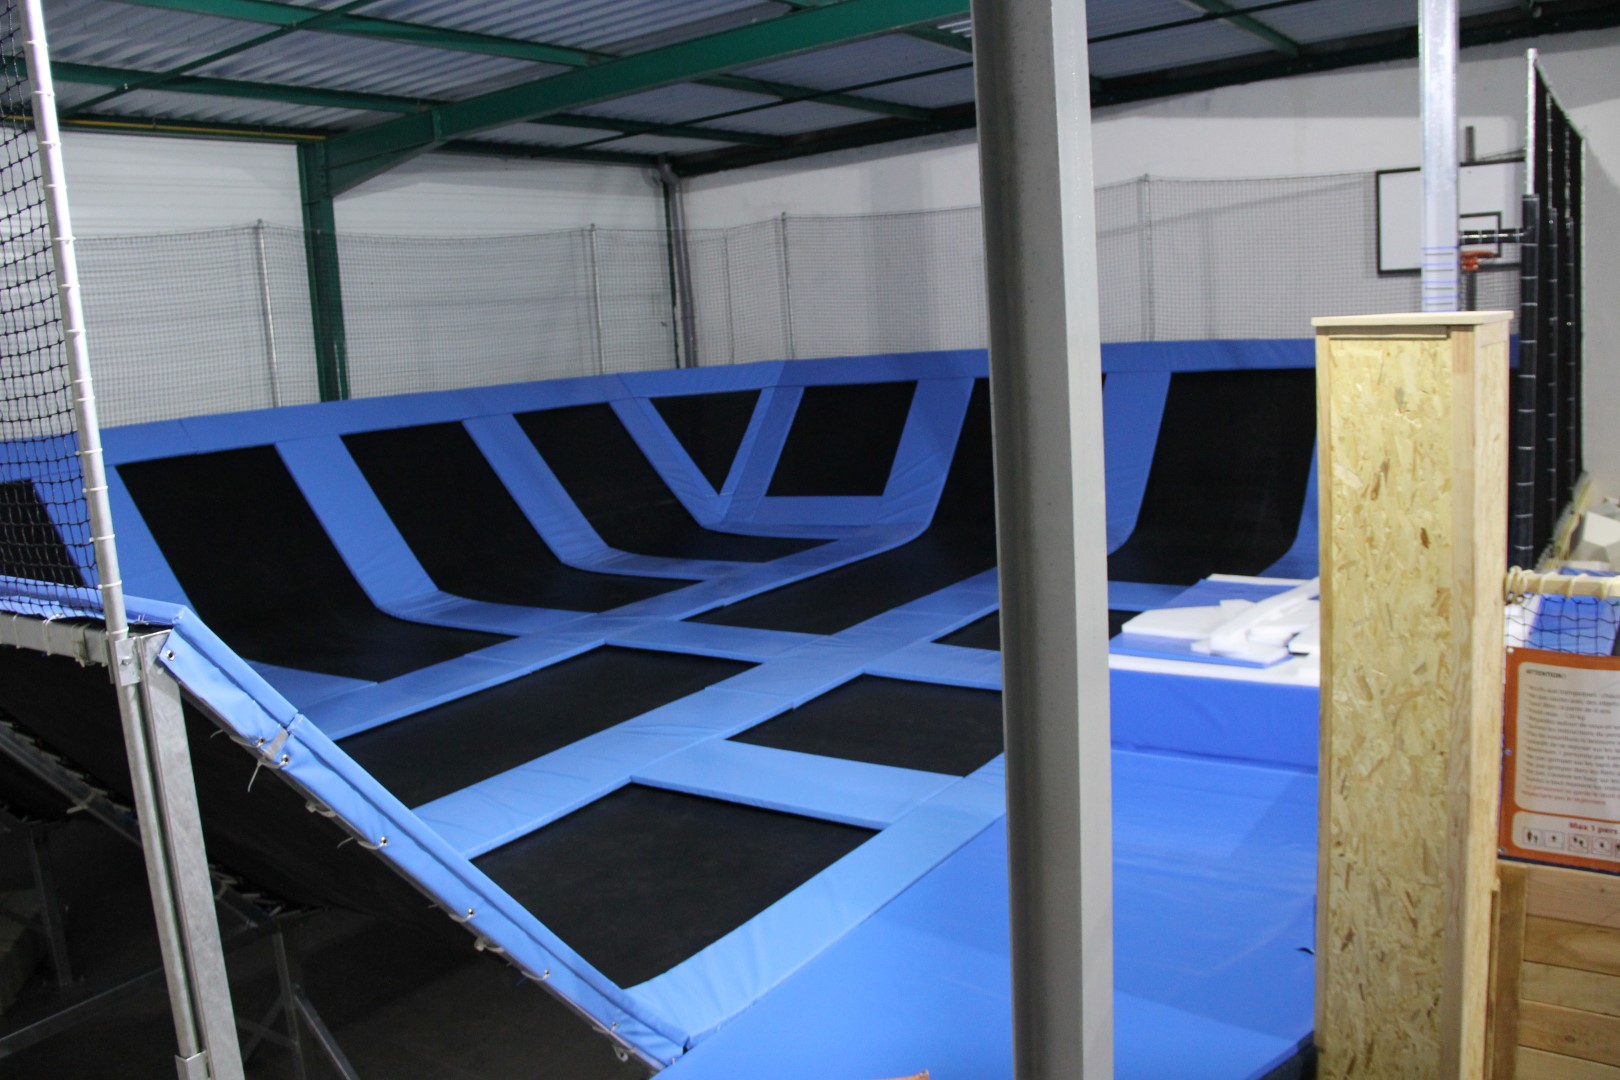 Small indoor trampoline hot girls wallpaper for Call girl salon de provence